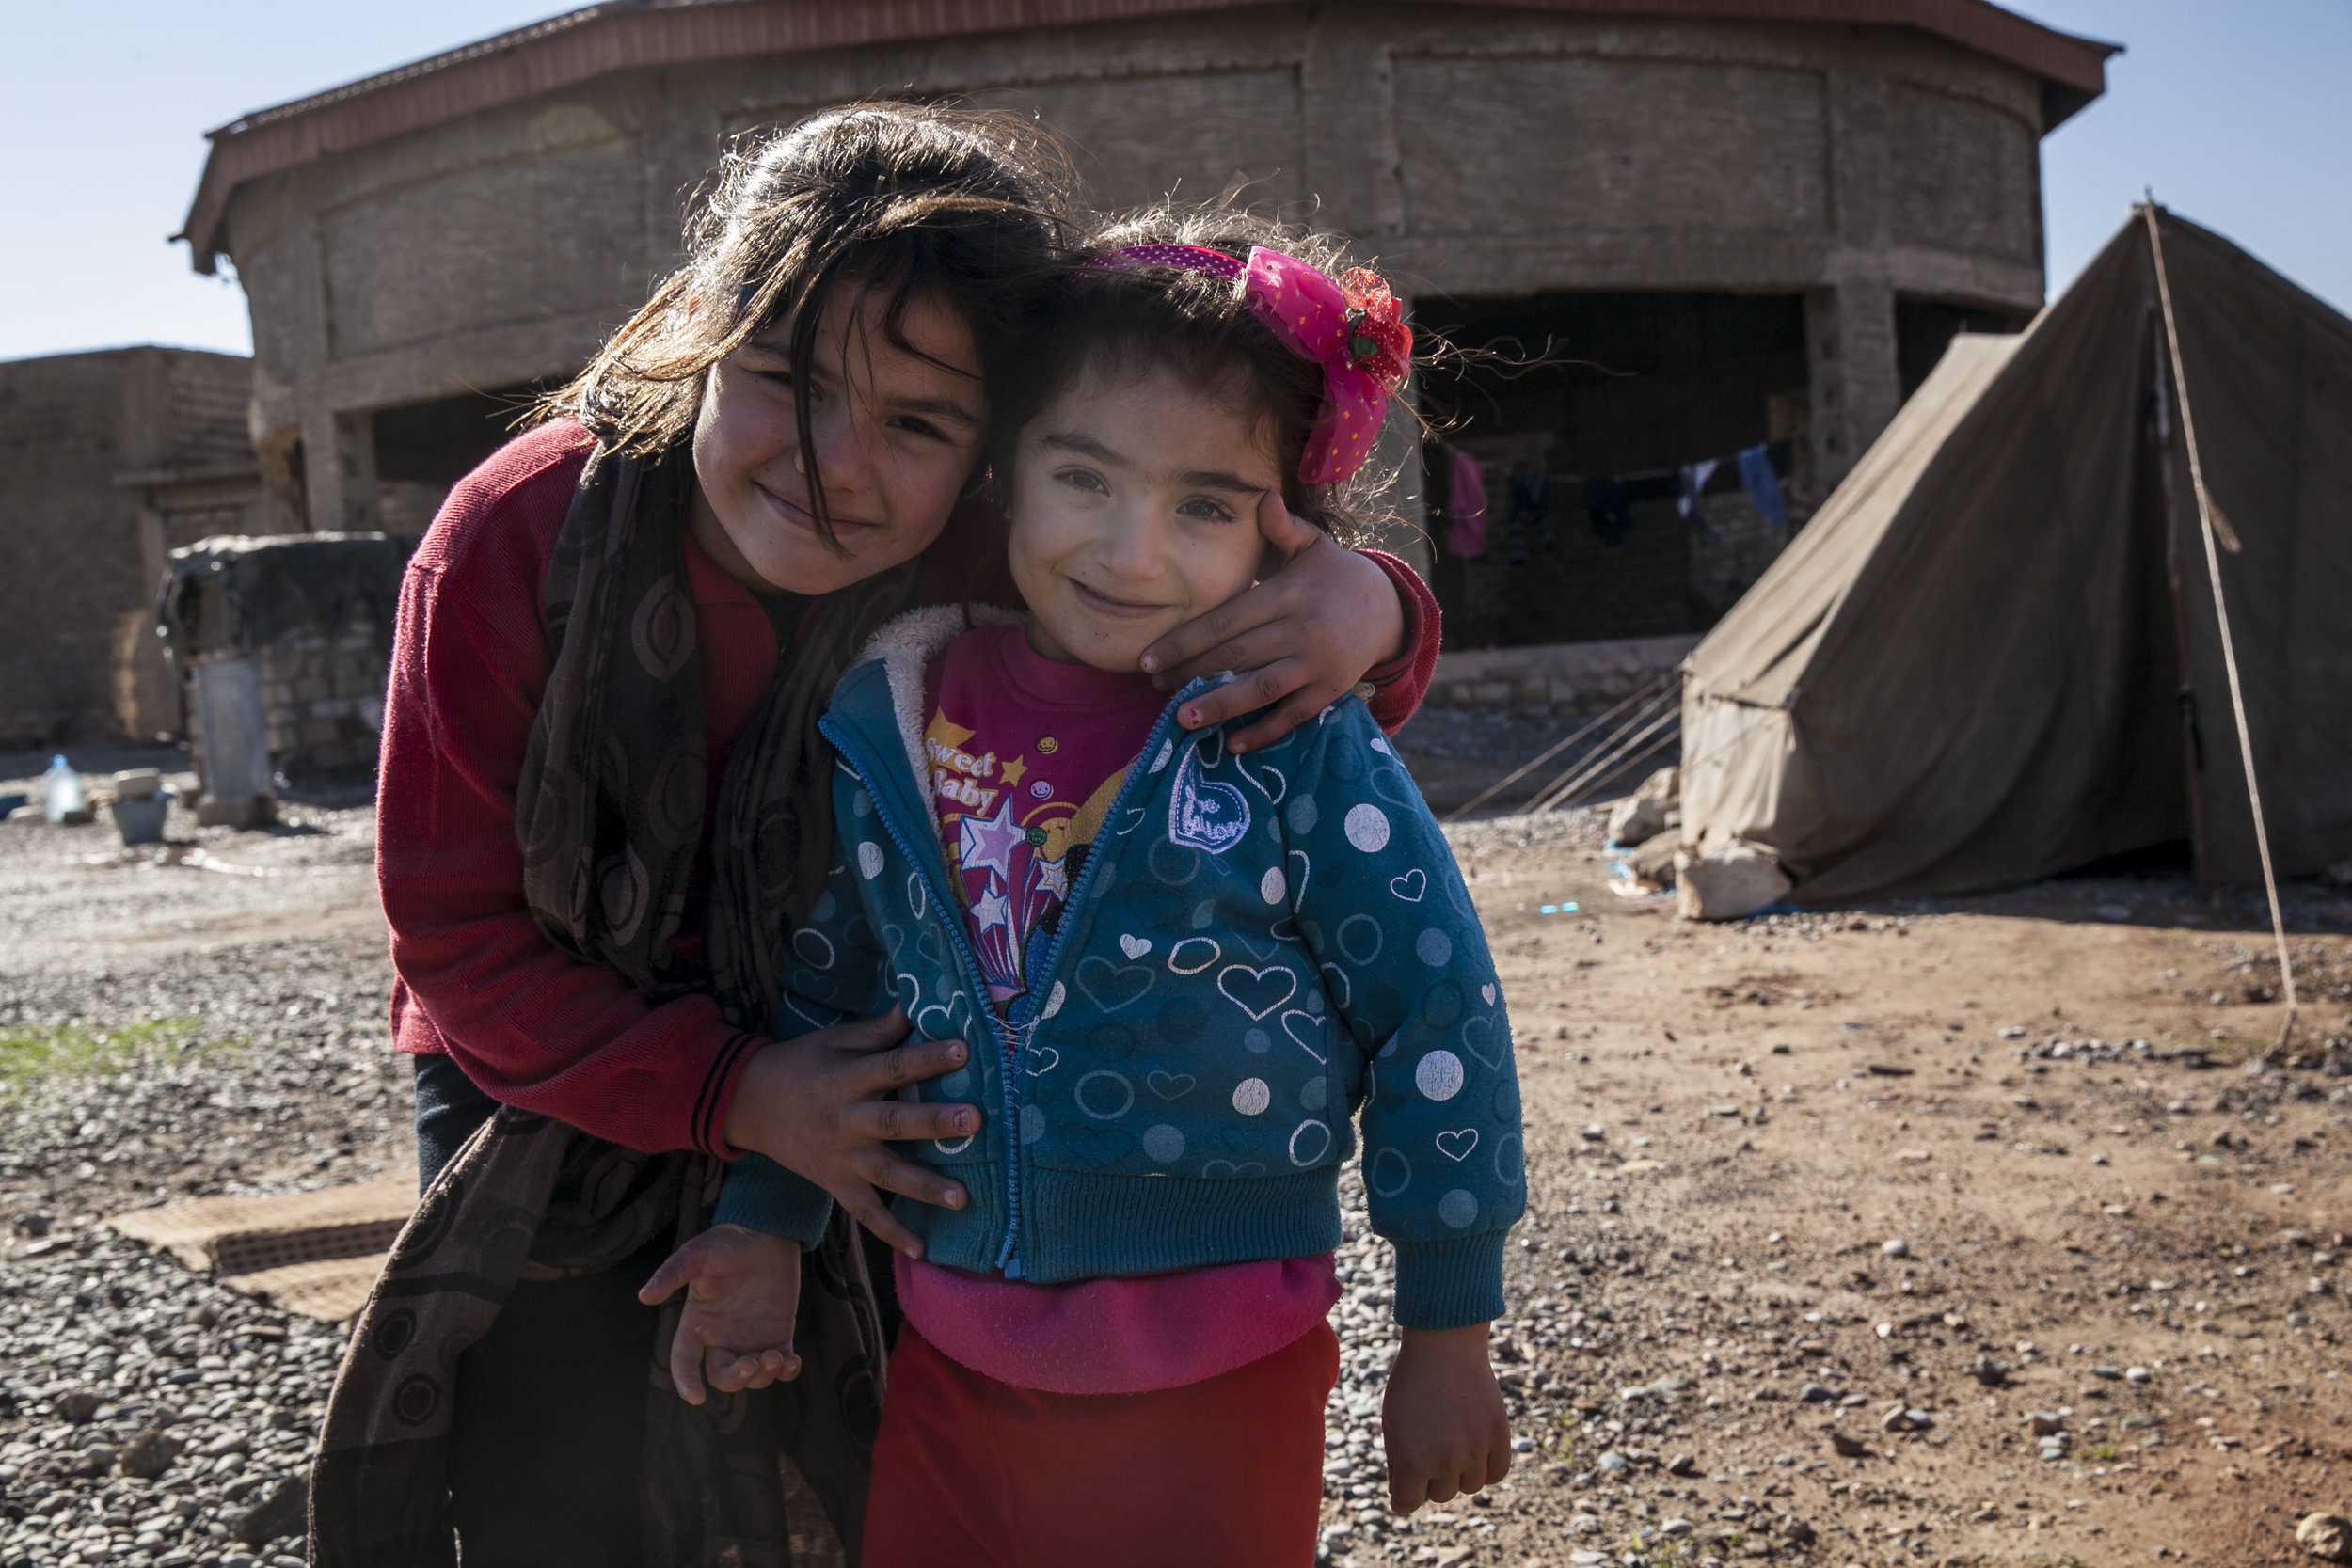 20141204_Refugees_GH_0014.jpg